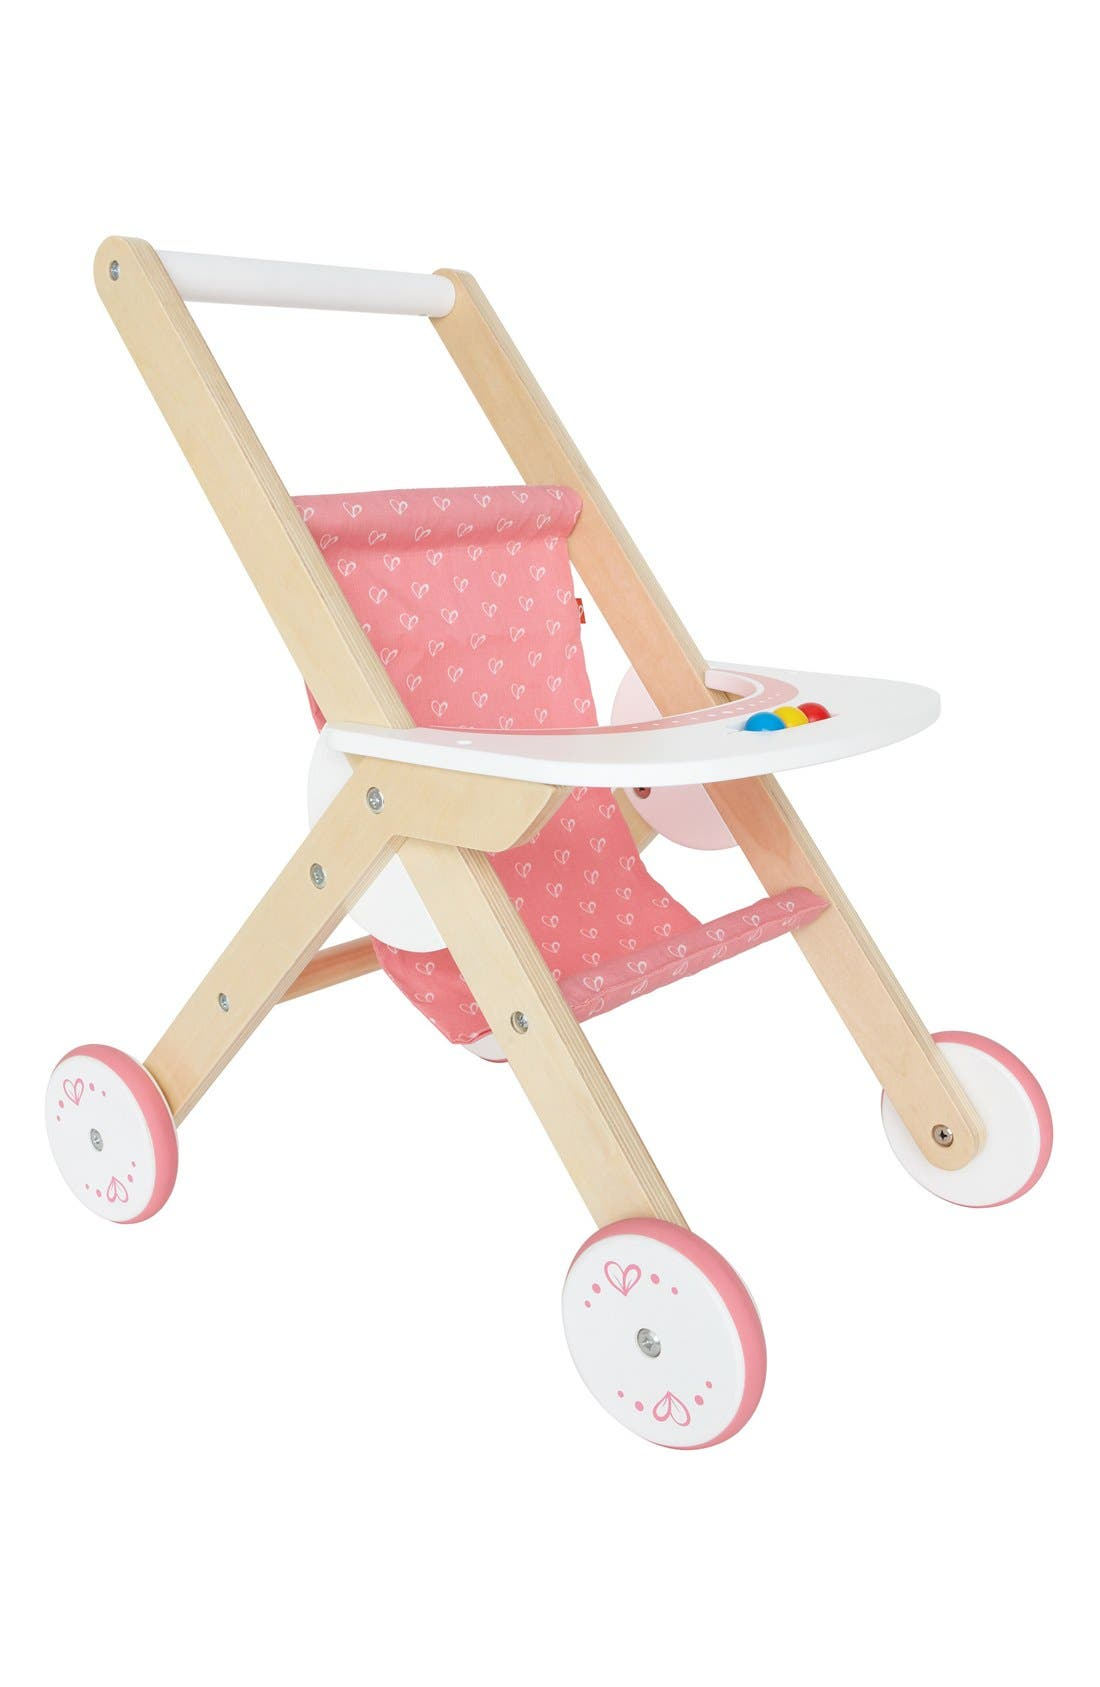 HAPE Play Stroller